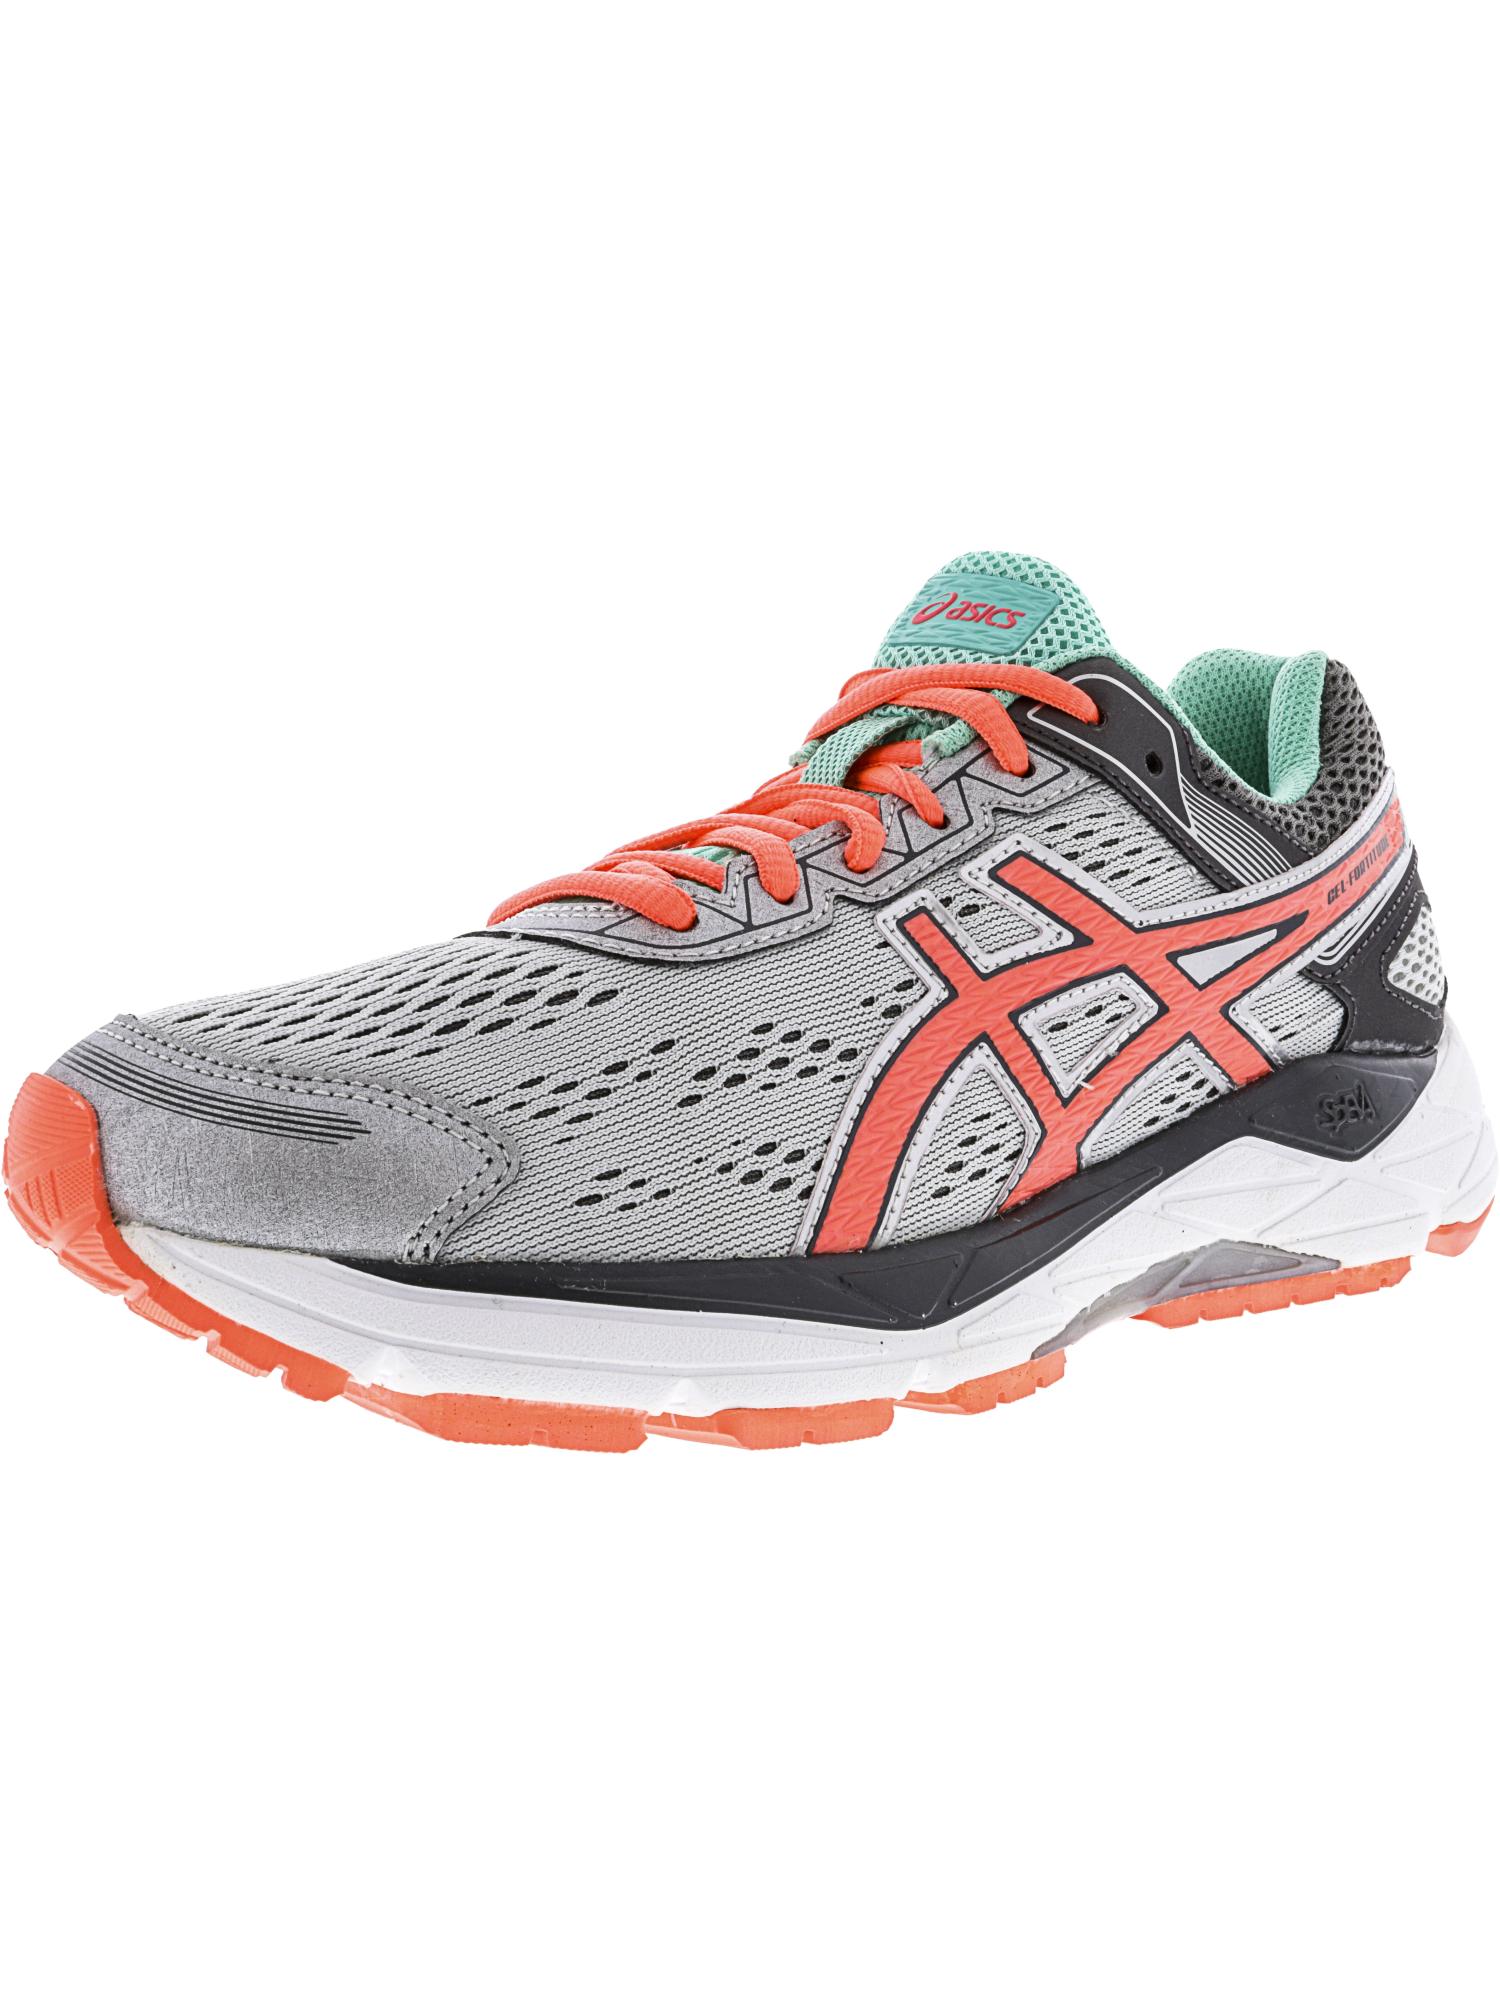 Womens Gel-Fortitude 7 Low-Top Sneakers Asics Ghb9COLHs7